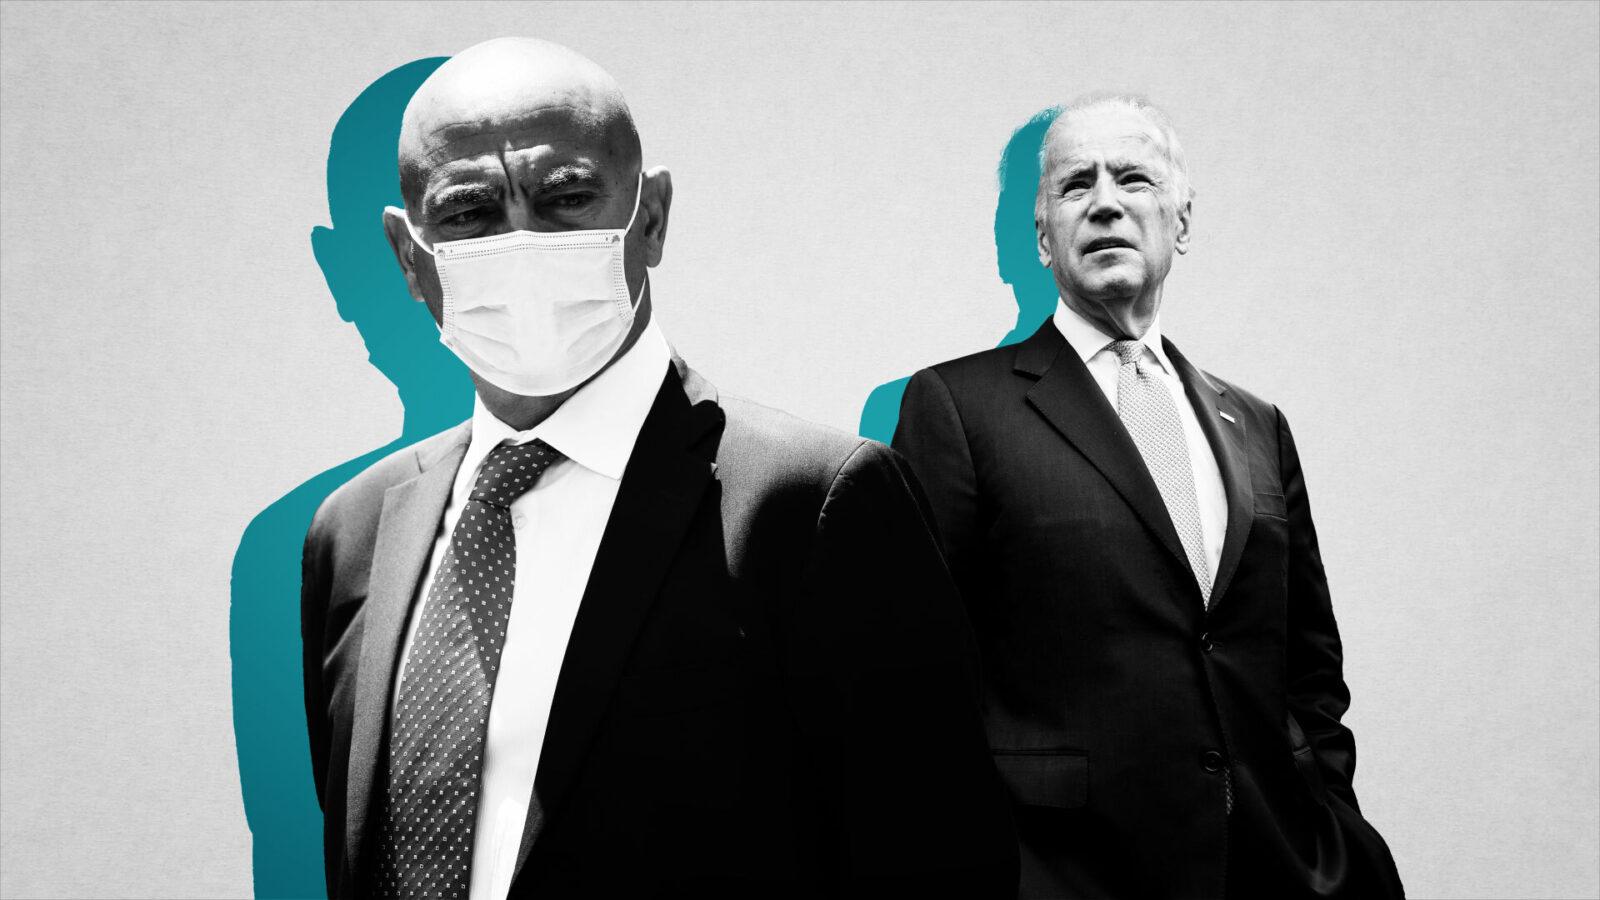 Democrats want to fire Warp Speed's Moncef Slaoui and overhaul the program. But if Biden wins, should he?